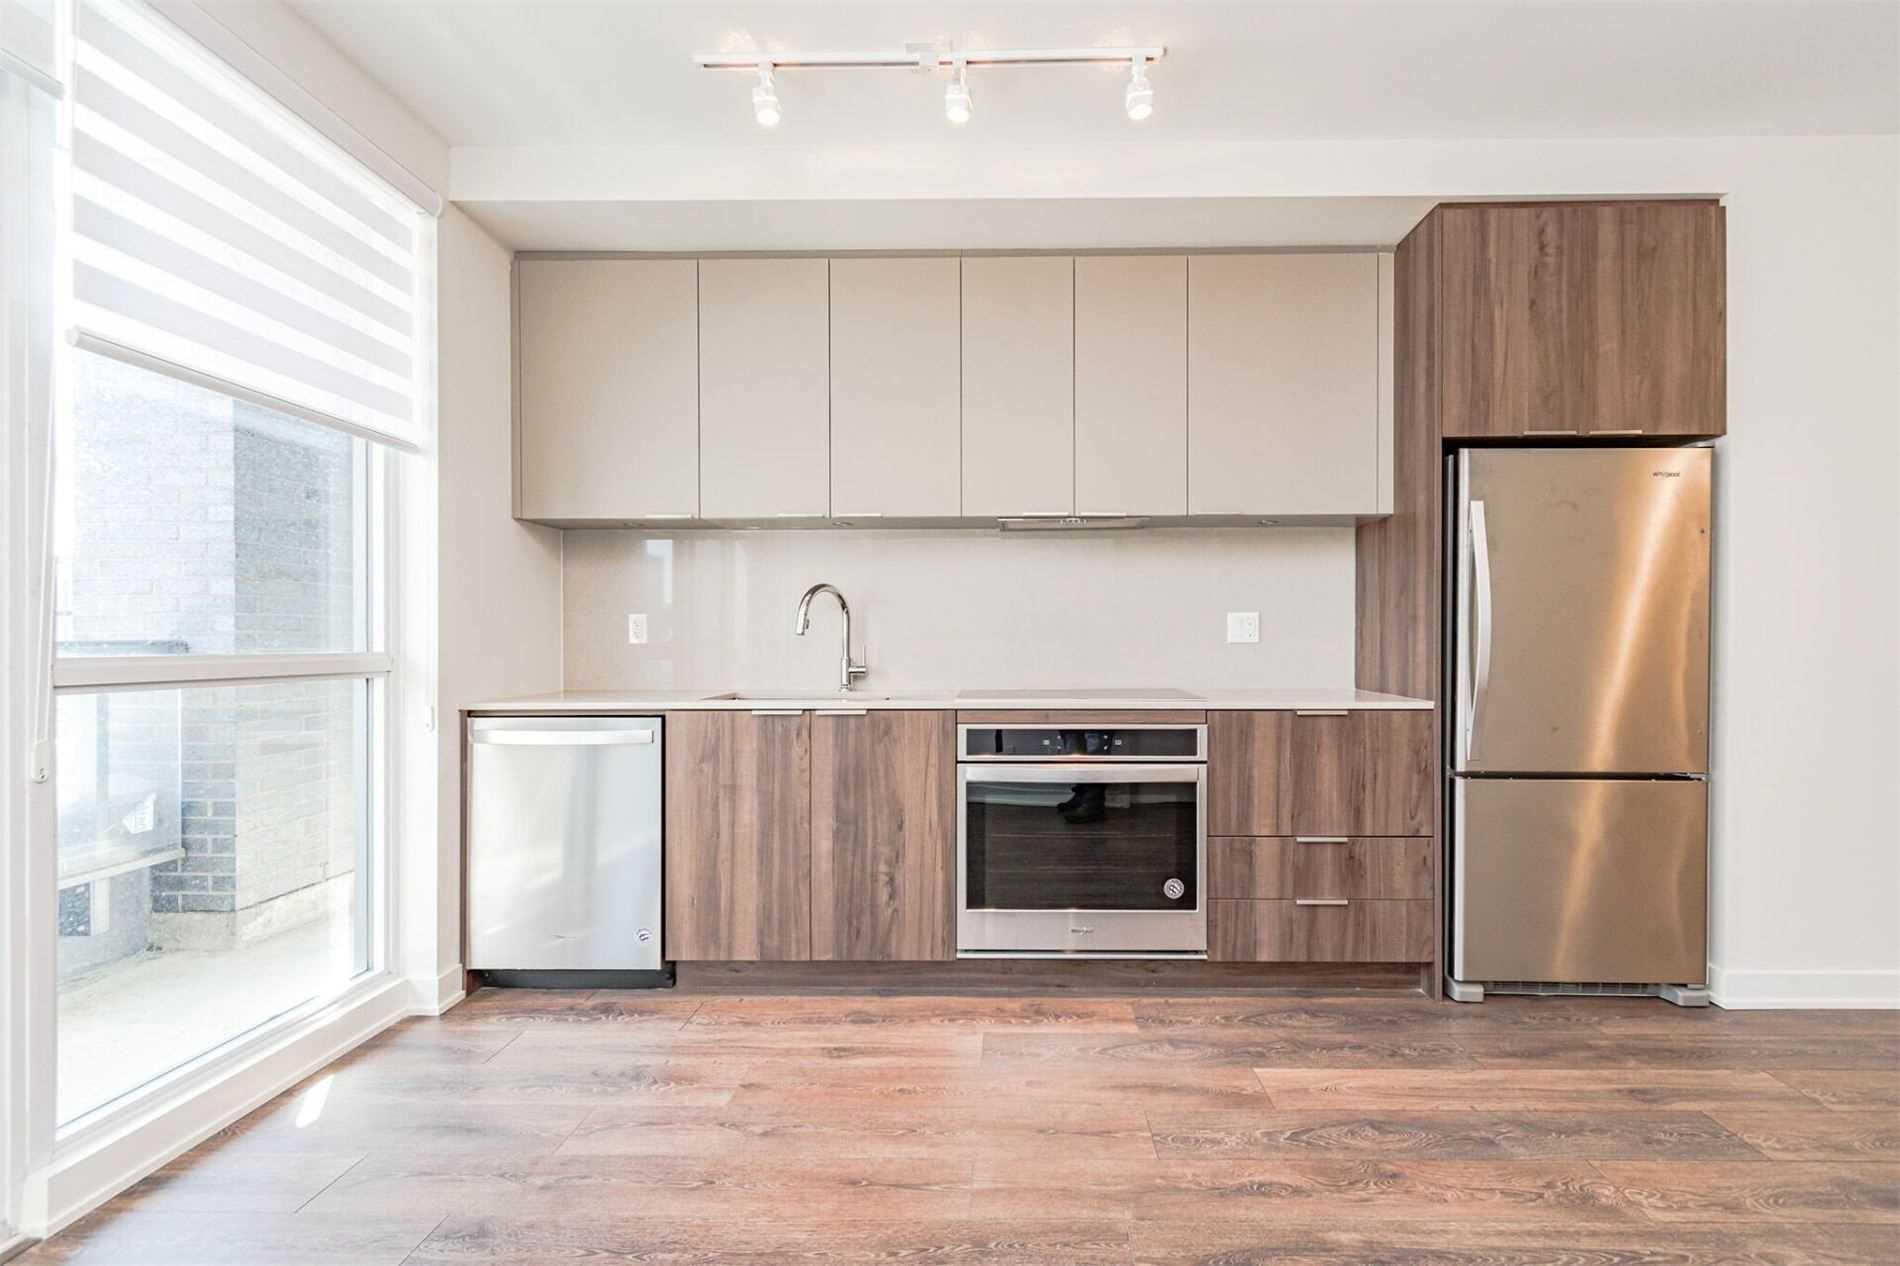 2 Sonic Way, Toronto, Ontario M3C 0P1, 3 Bedrooms Bedrooms, 5 Rooms Rooms,2 BathroomsBathrooms,Condo Apt,For Sale,Sonic,C5367540